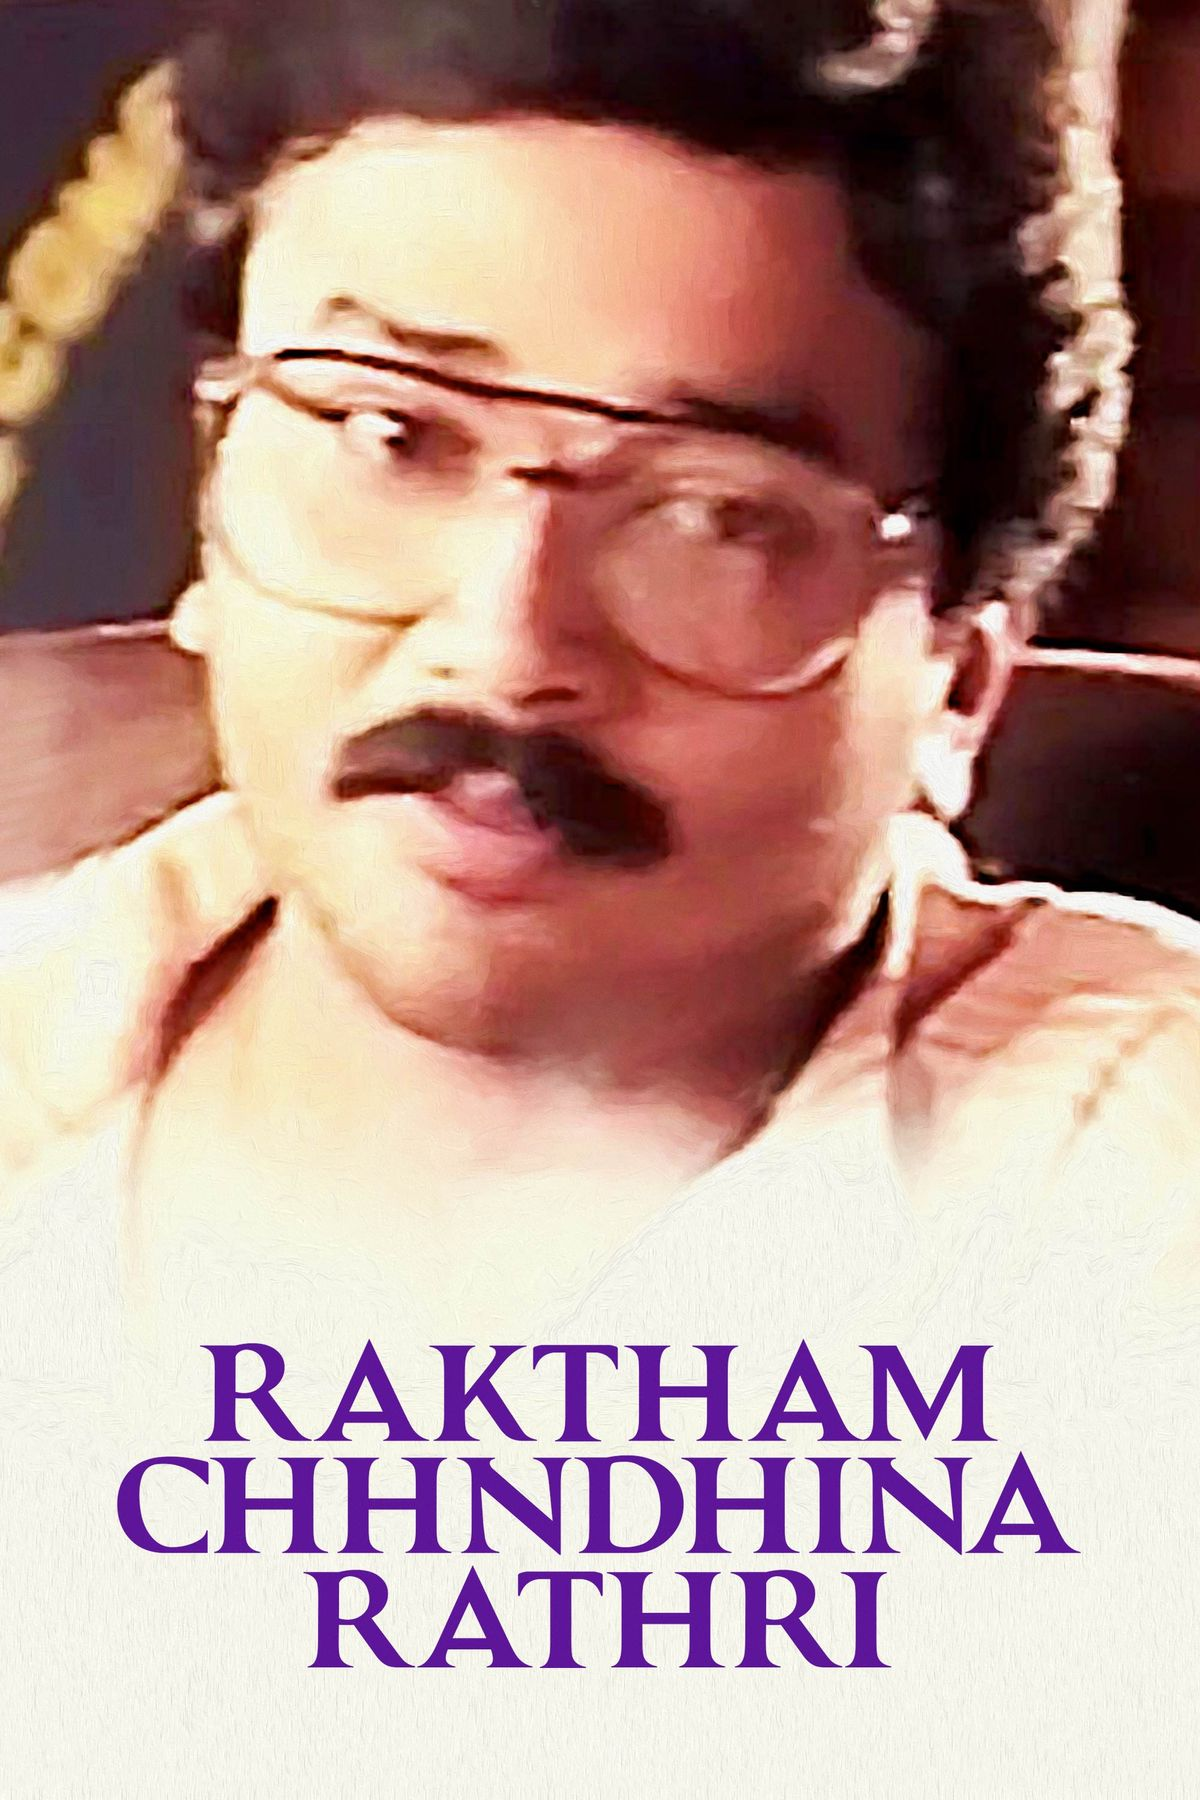 Raktham Chhndhina Rathri